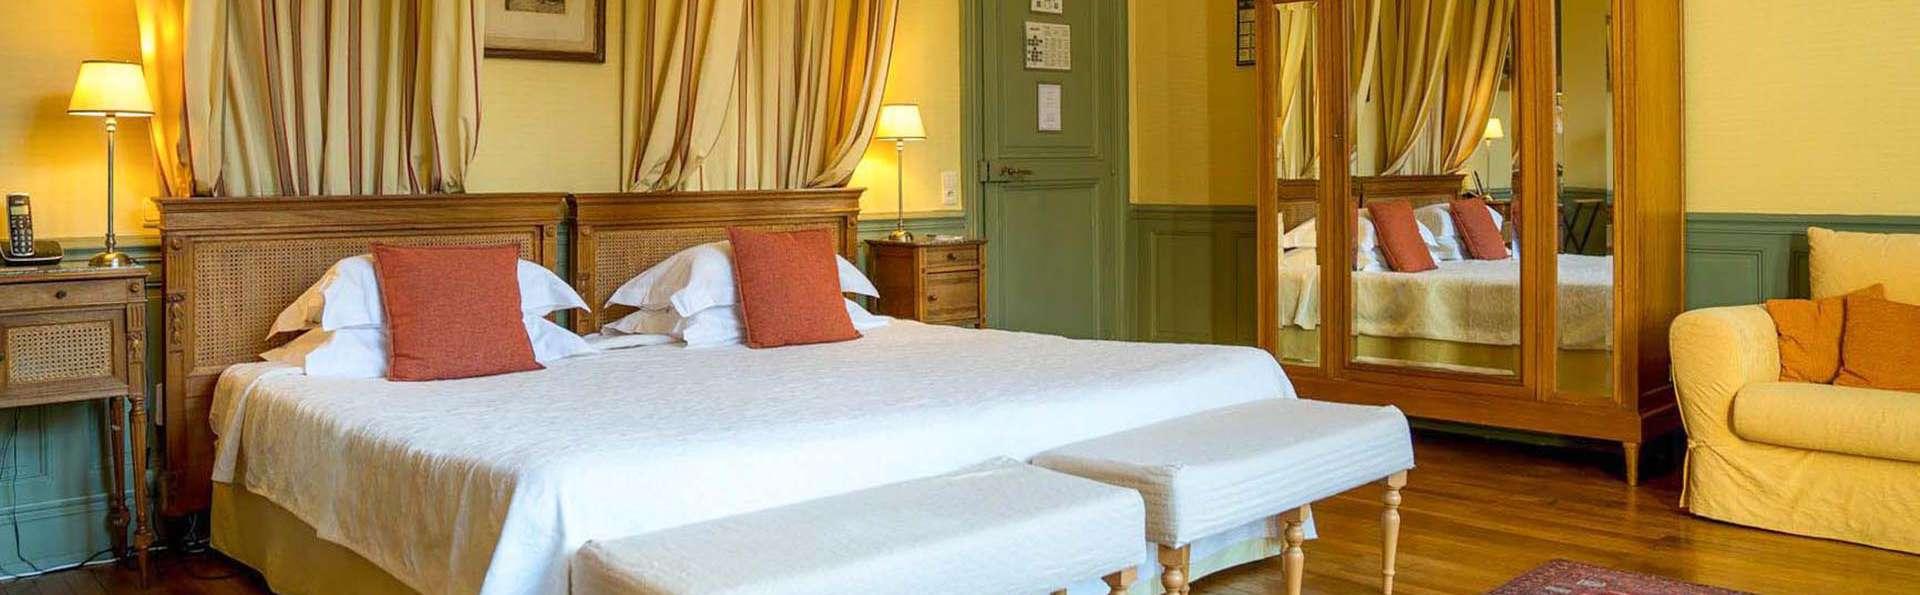 Hotel Château de Verrières & Spa Saumur - EDIT_BEDROOM_03.jpg